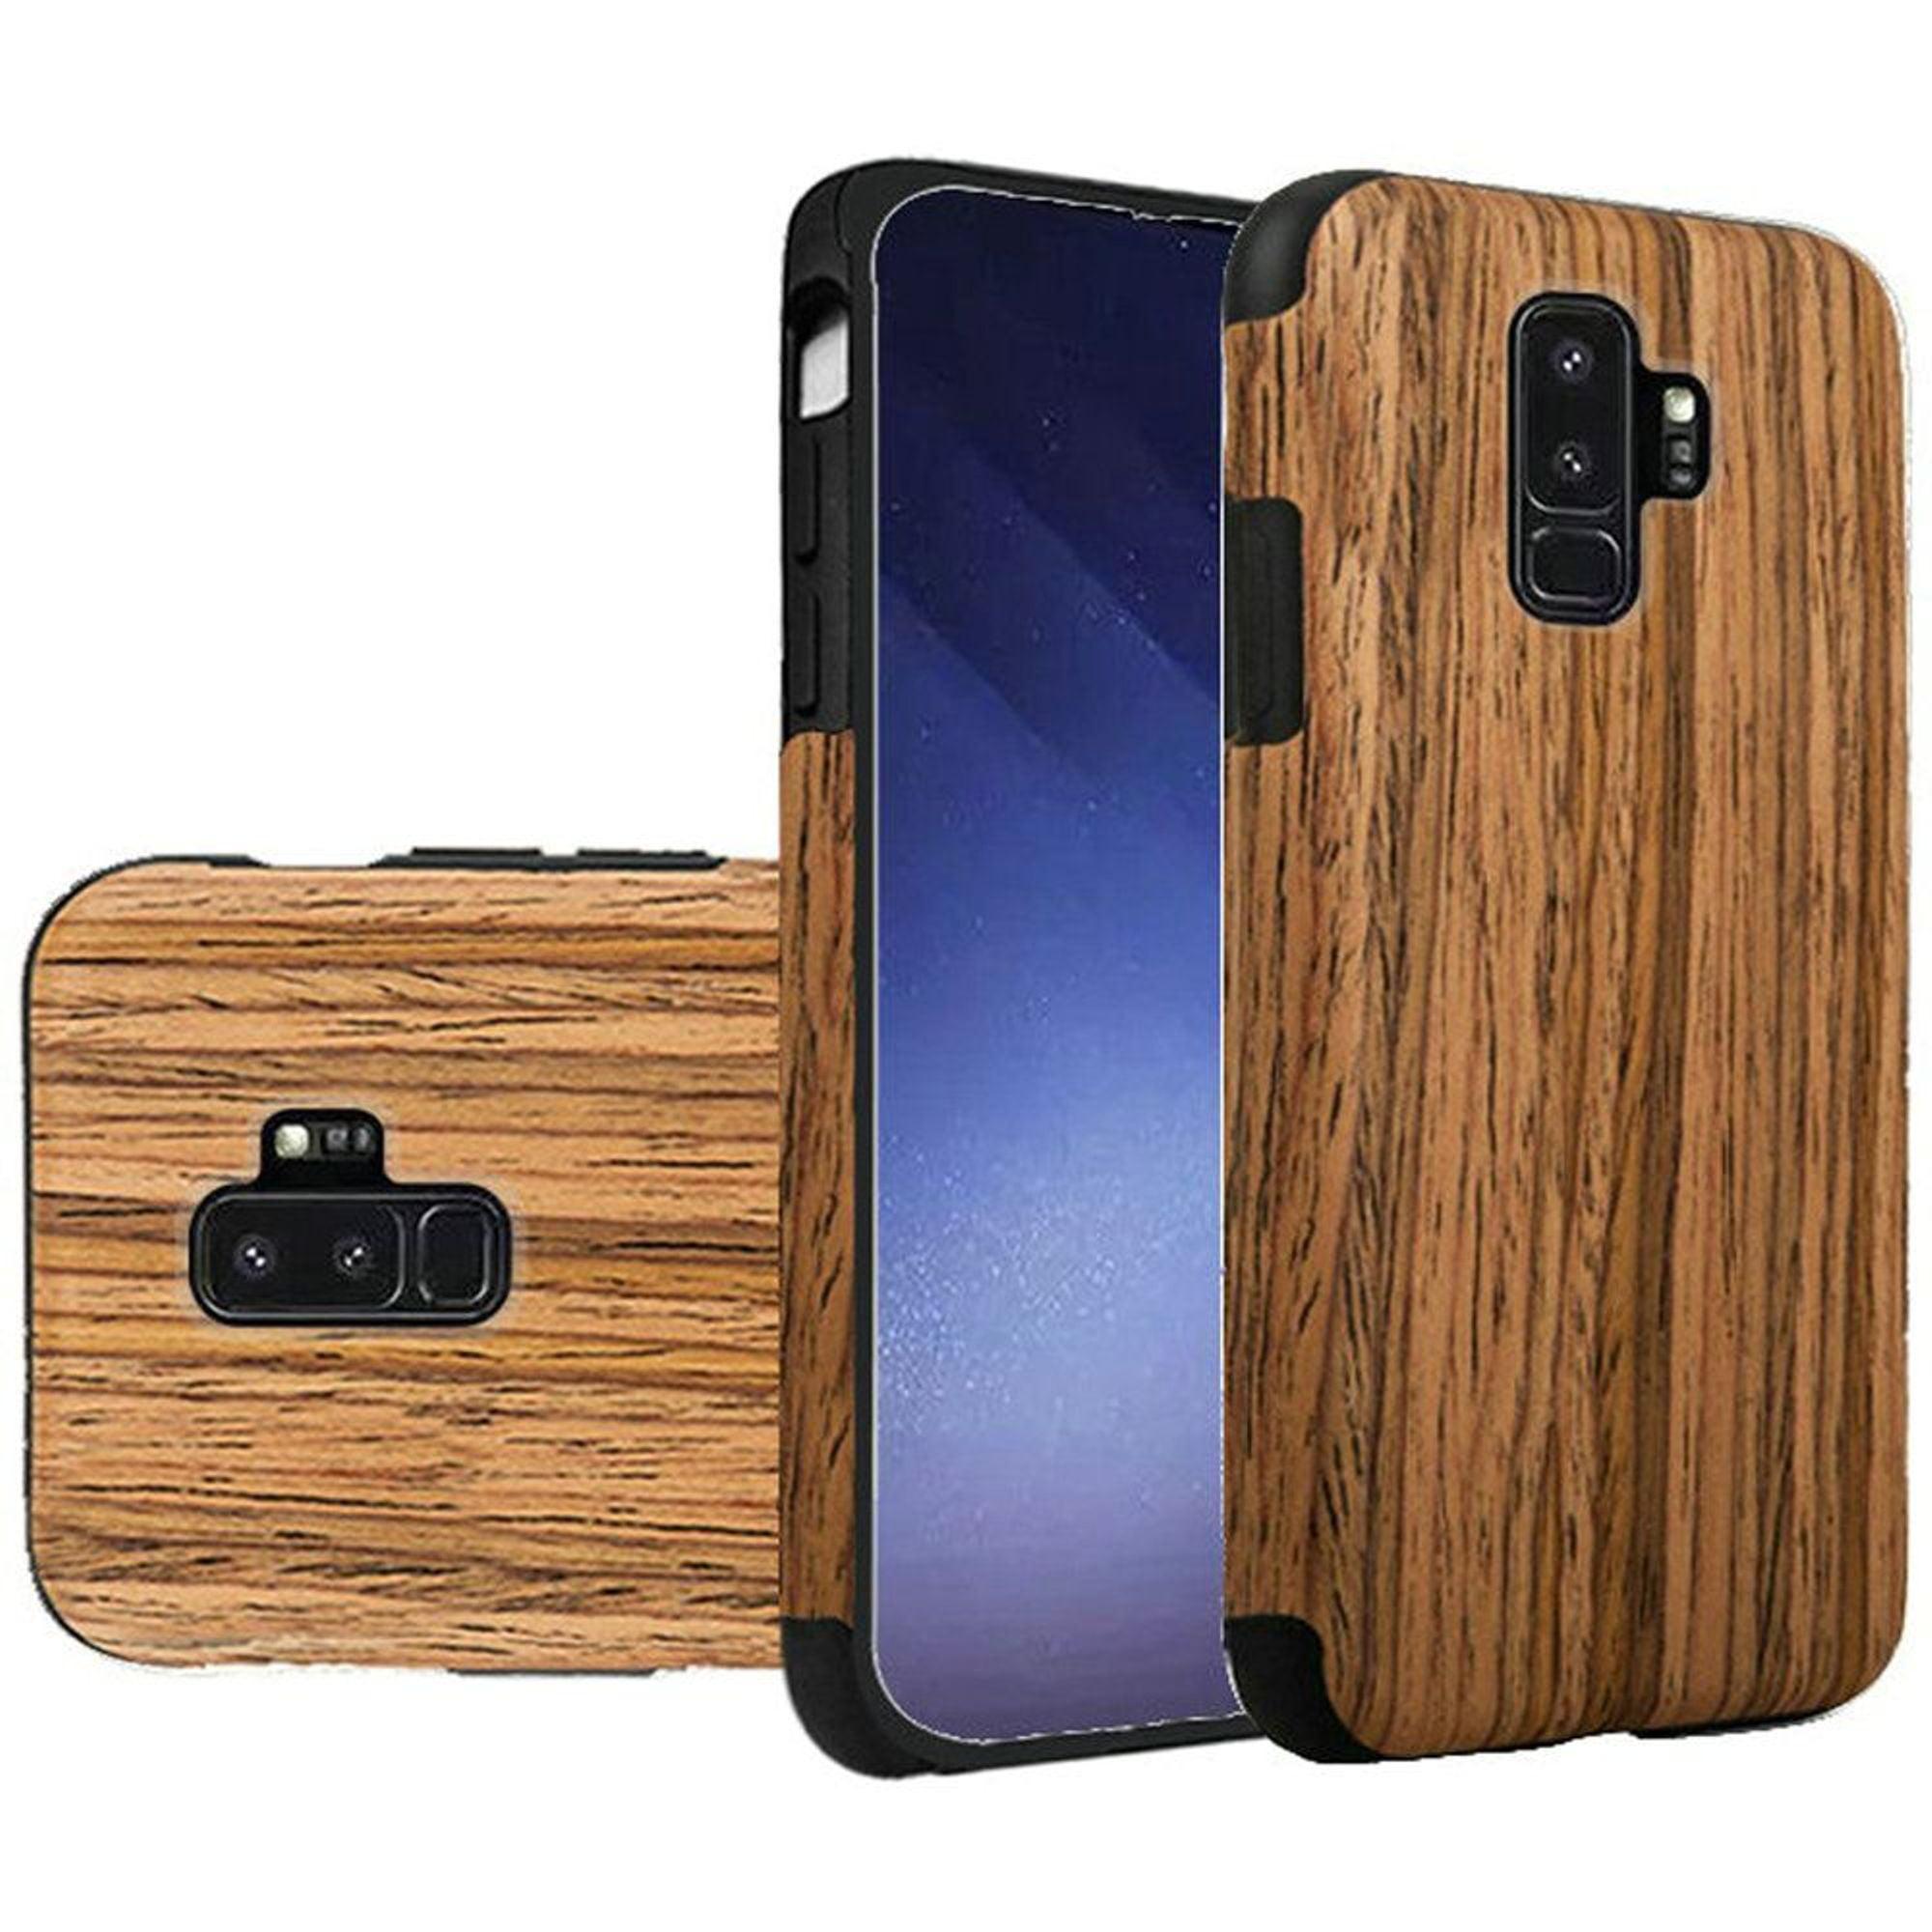 hot sale online 0dd2d 4e050 Samsung Galaxy S9 Plus Case, by HR Wireless Wood Grain TPU Rubber Candy  Skin Case Cover For Samsung Galaxy S9 Plus S9+